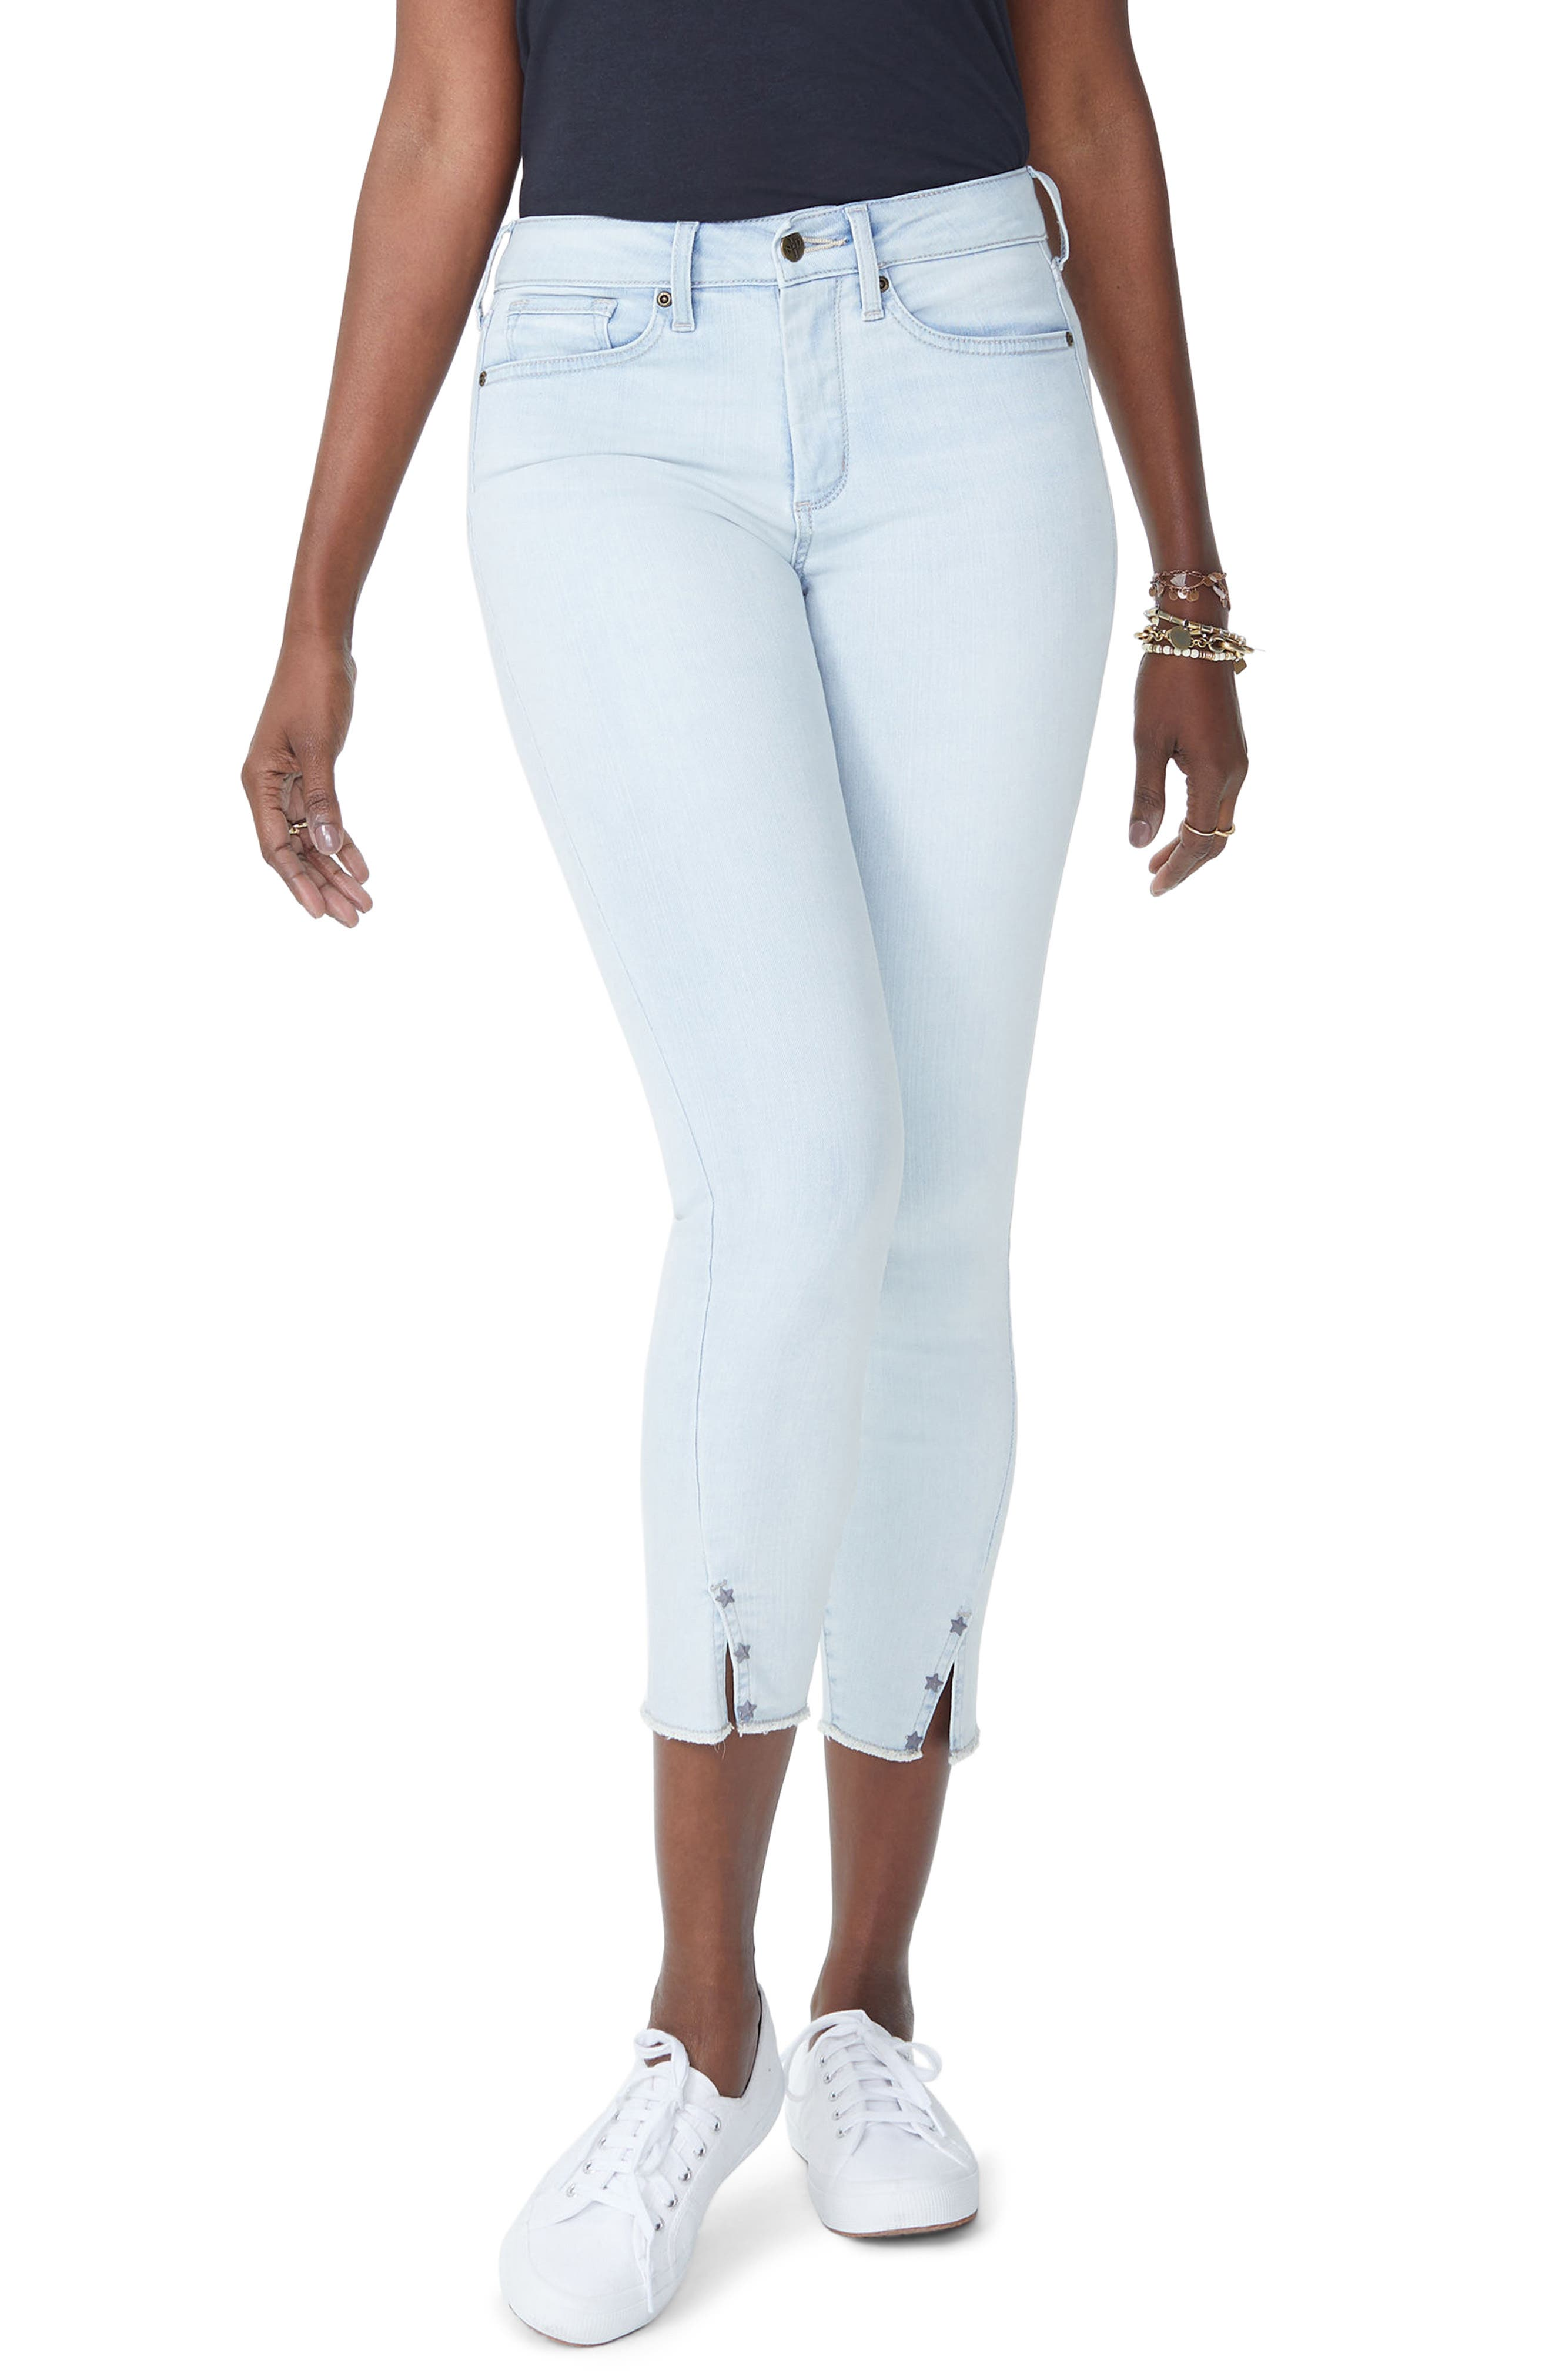 Ami High Waist Twist Seam Stretch Ankle Skinny Jeans,                         Main,                         color, PALM DESERT